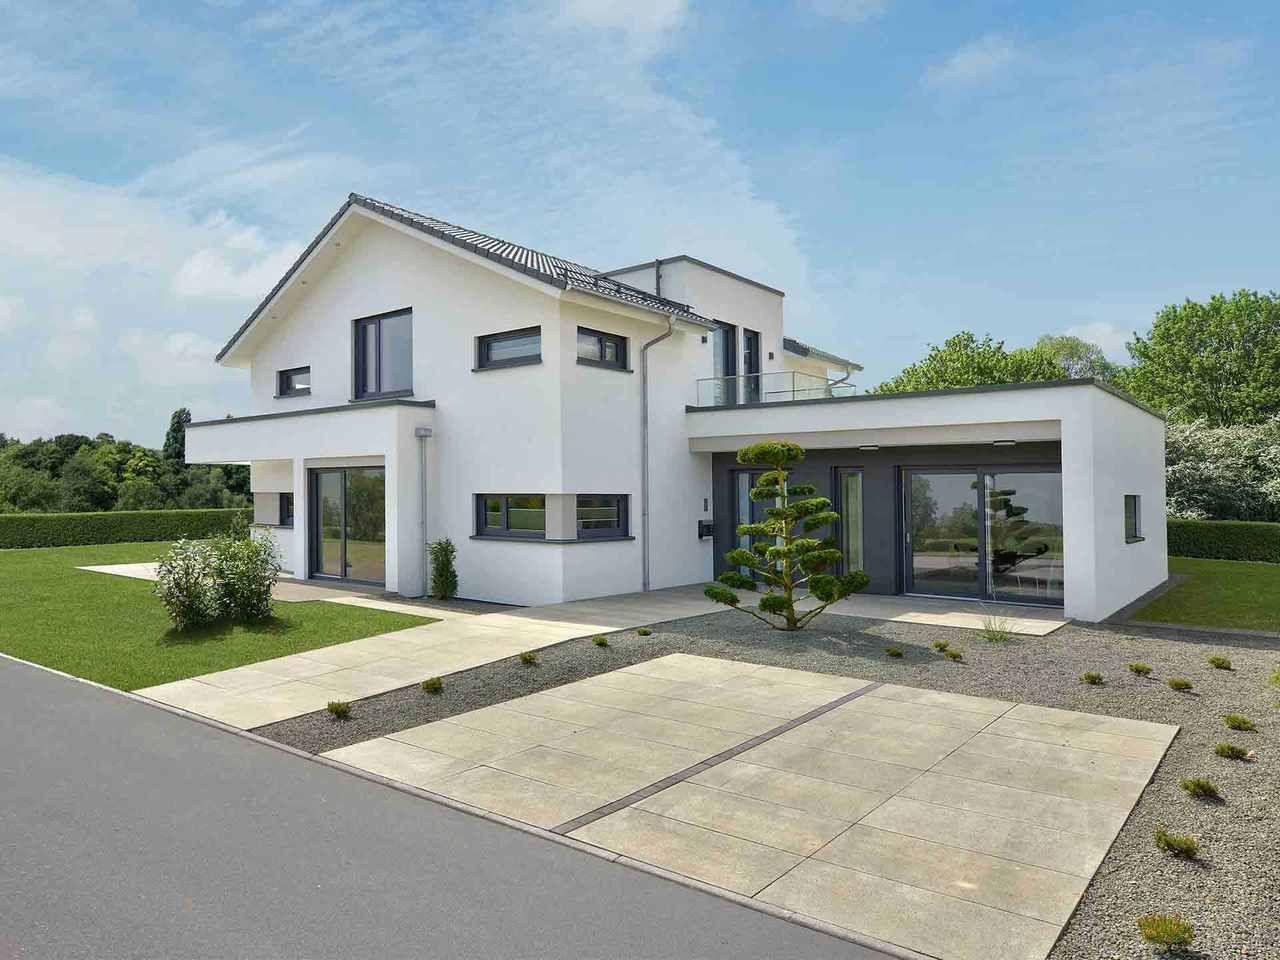 Musterhaus CONCEPTM 166 Erfurt in 2020 Musterhaus, Haus